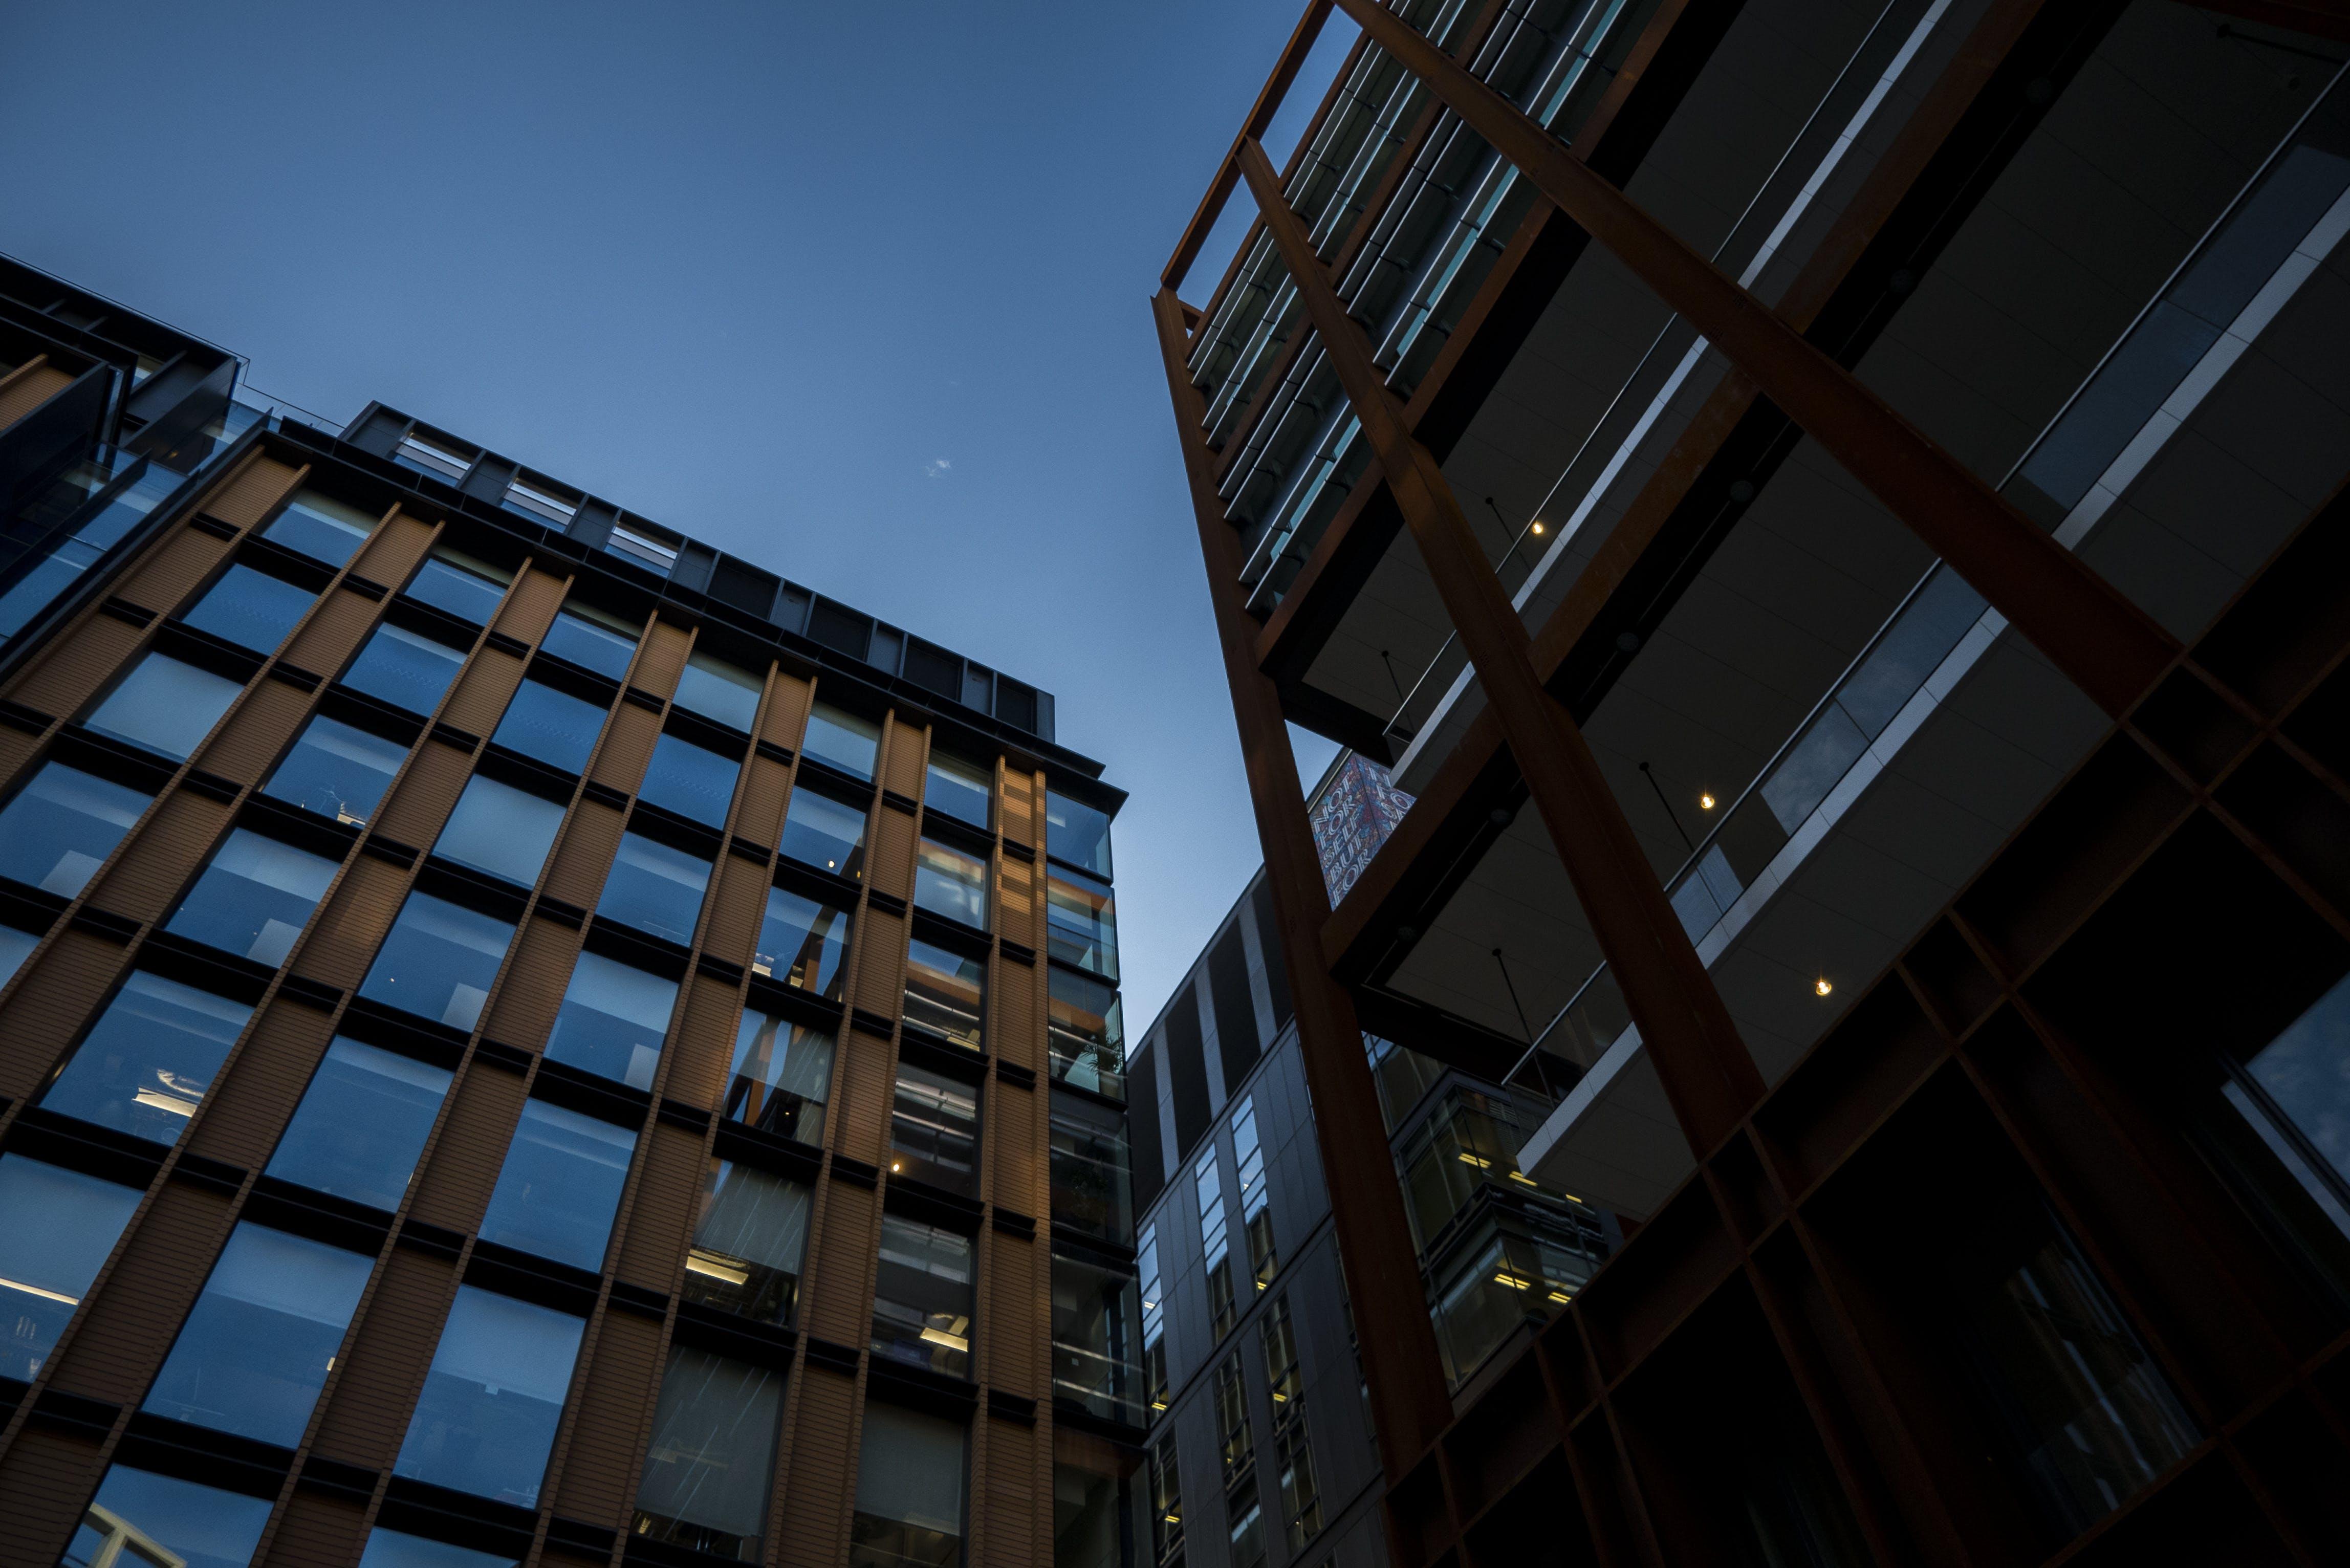 Free stock photo of blue sky, city, cityscape, crystal glass